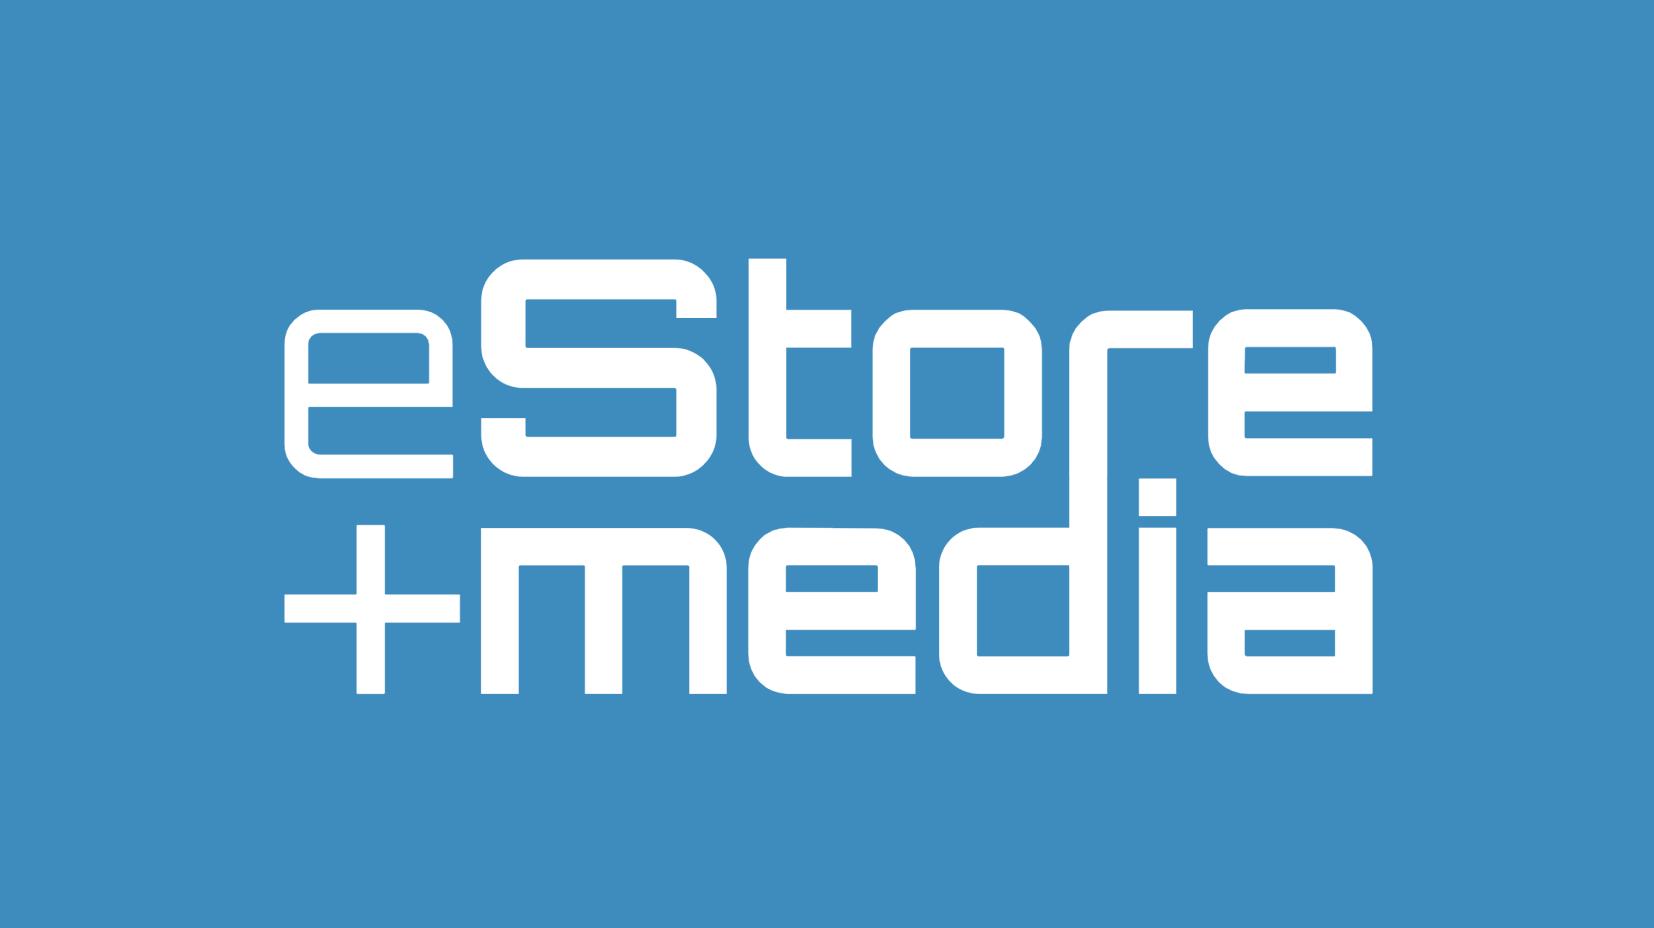 Tech & Product DD | Growth | Code & Co. advises Kennet Partners on eStoreMedia